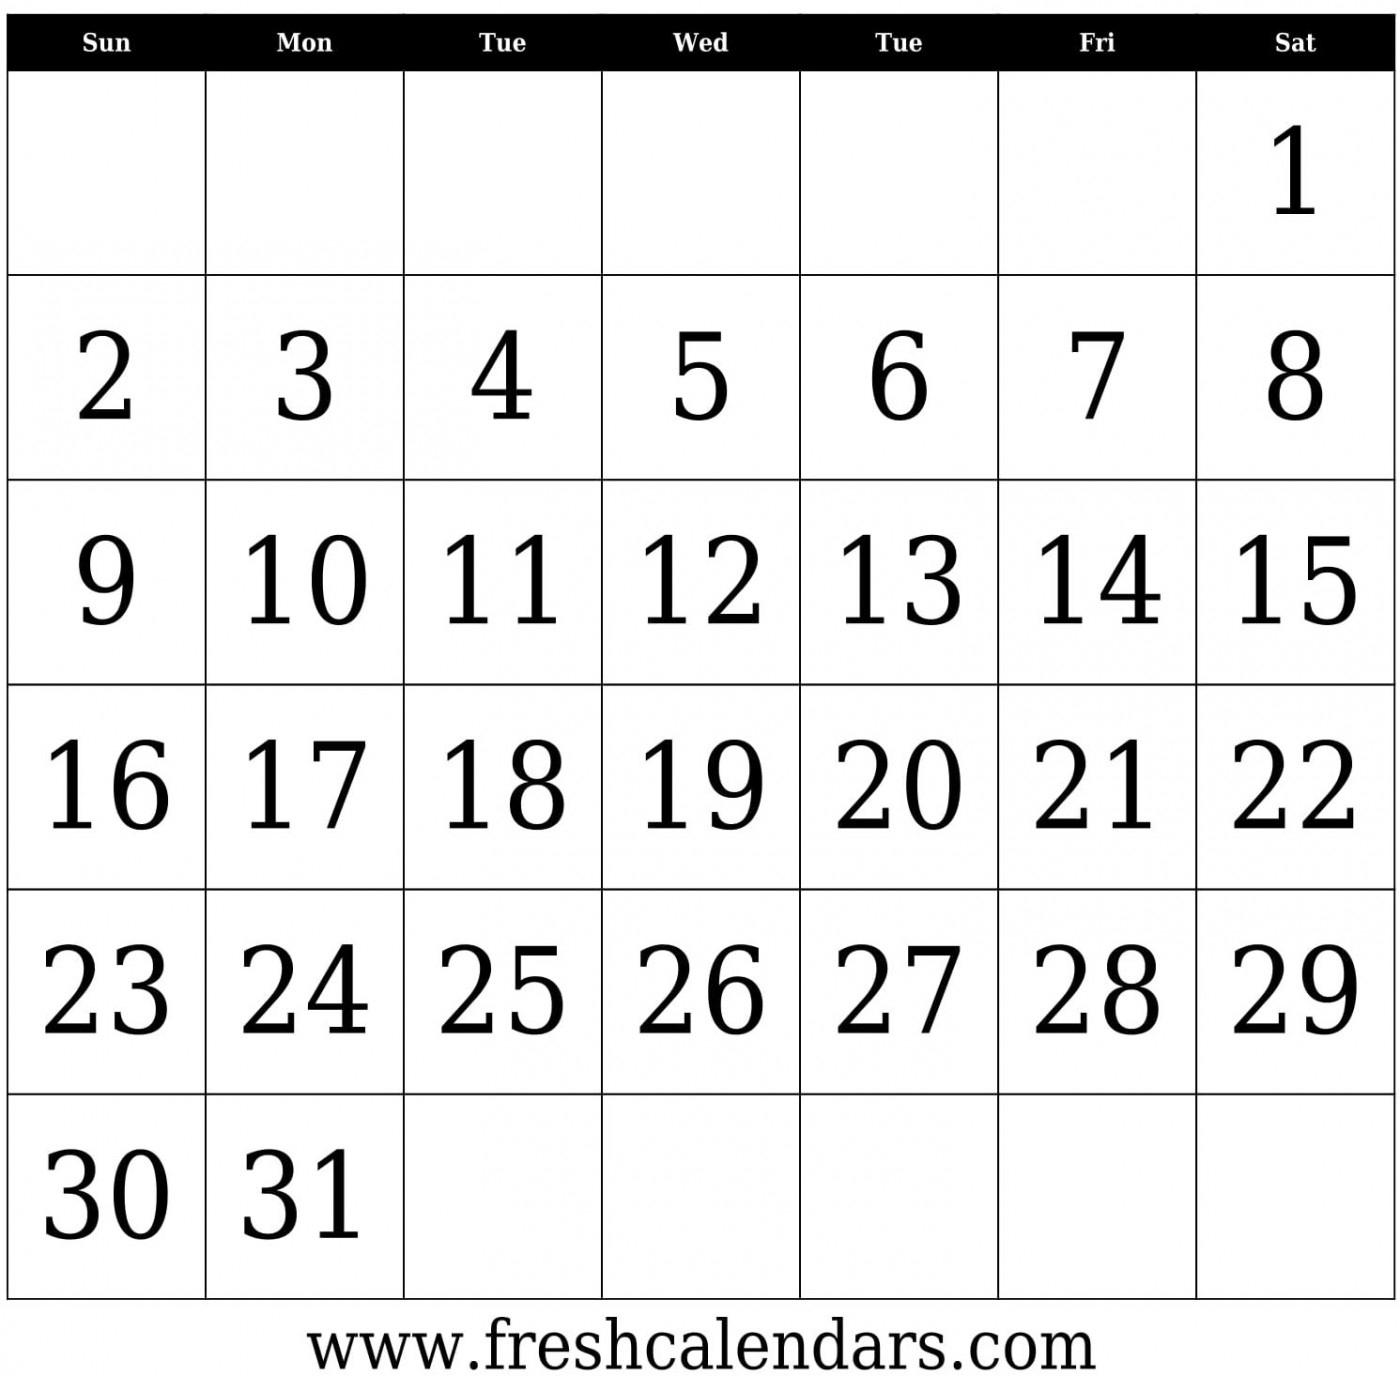 016 Weekly Schedule Day Calendar Template Printable Striking regarding 30 Day Blank Calendar